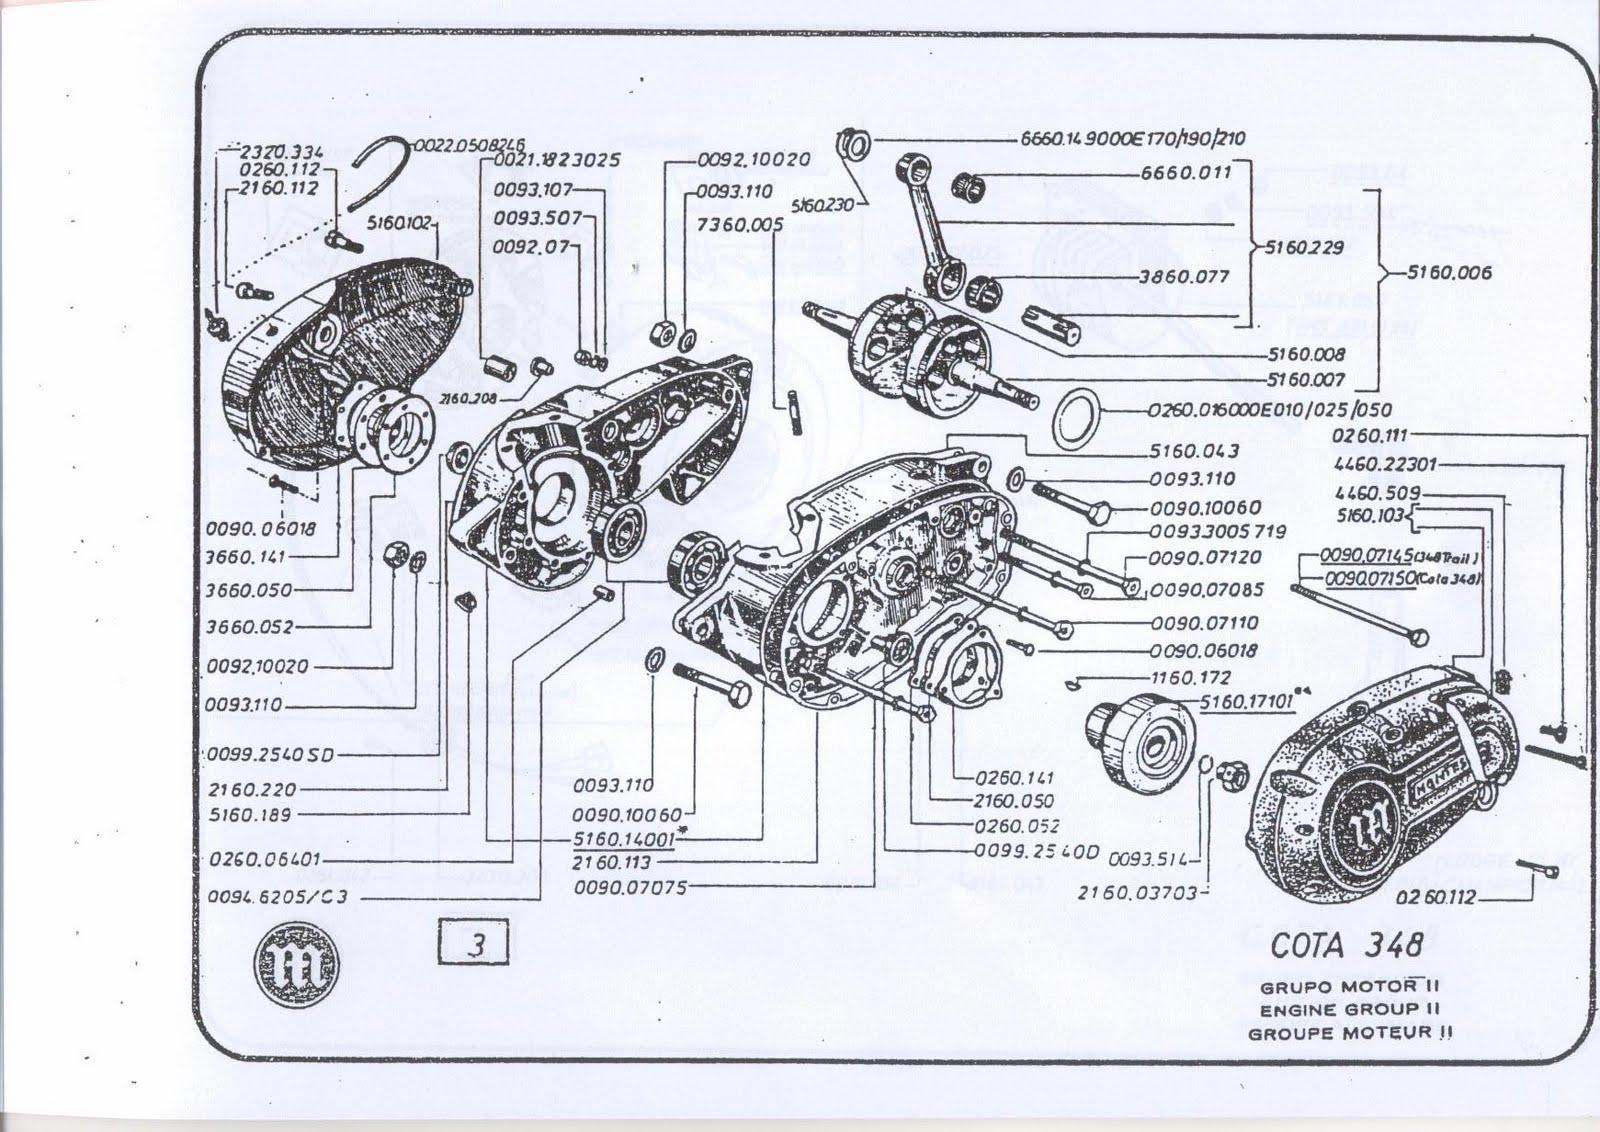 Montesa Cota 348 09 Grupo Motor Ii